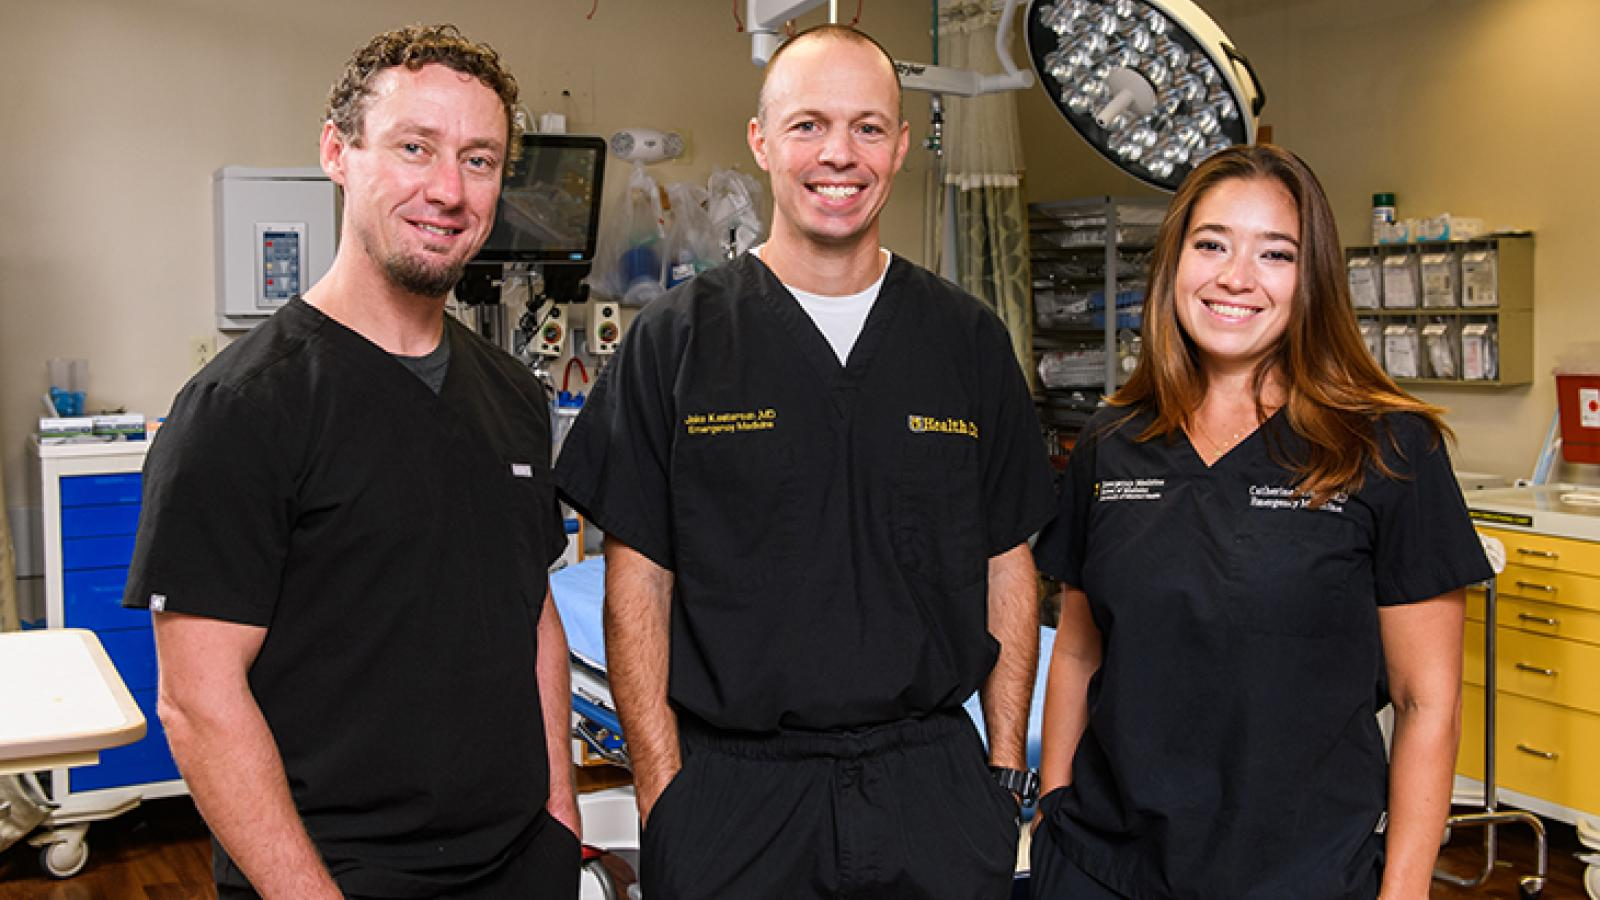 EM Dr. Shea, Dr. Kesterson and Dr. Parker